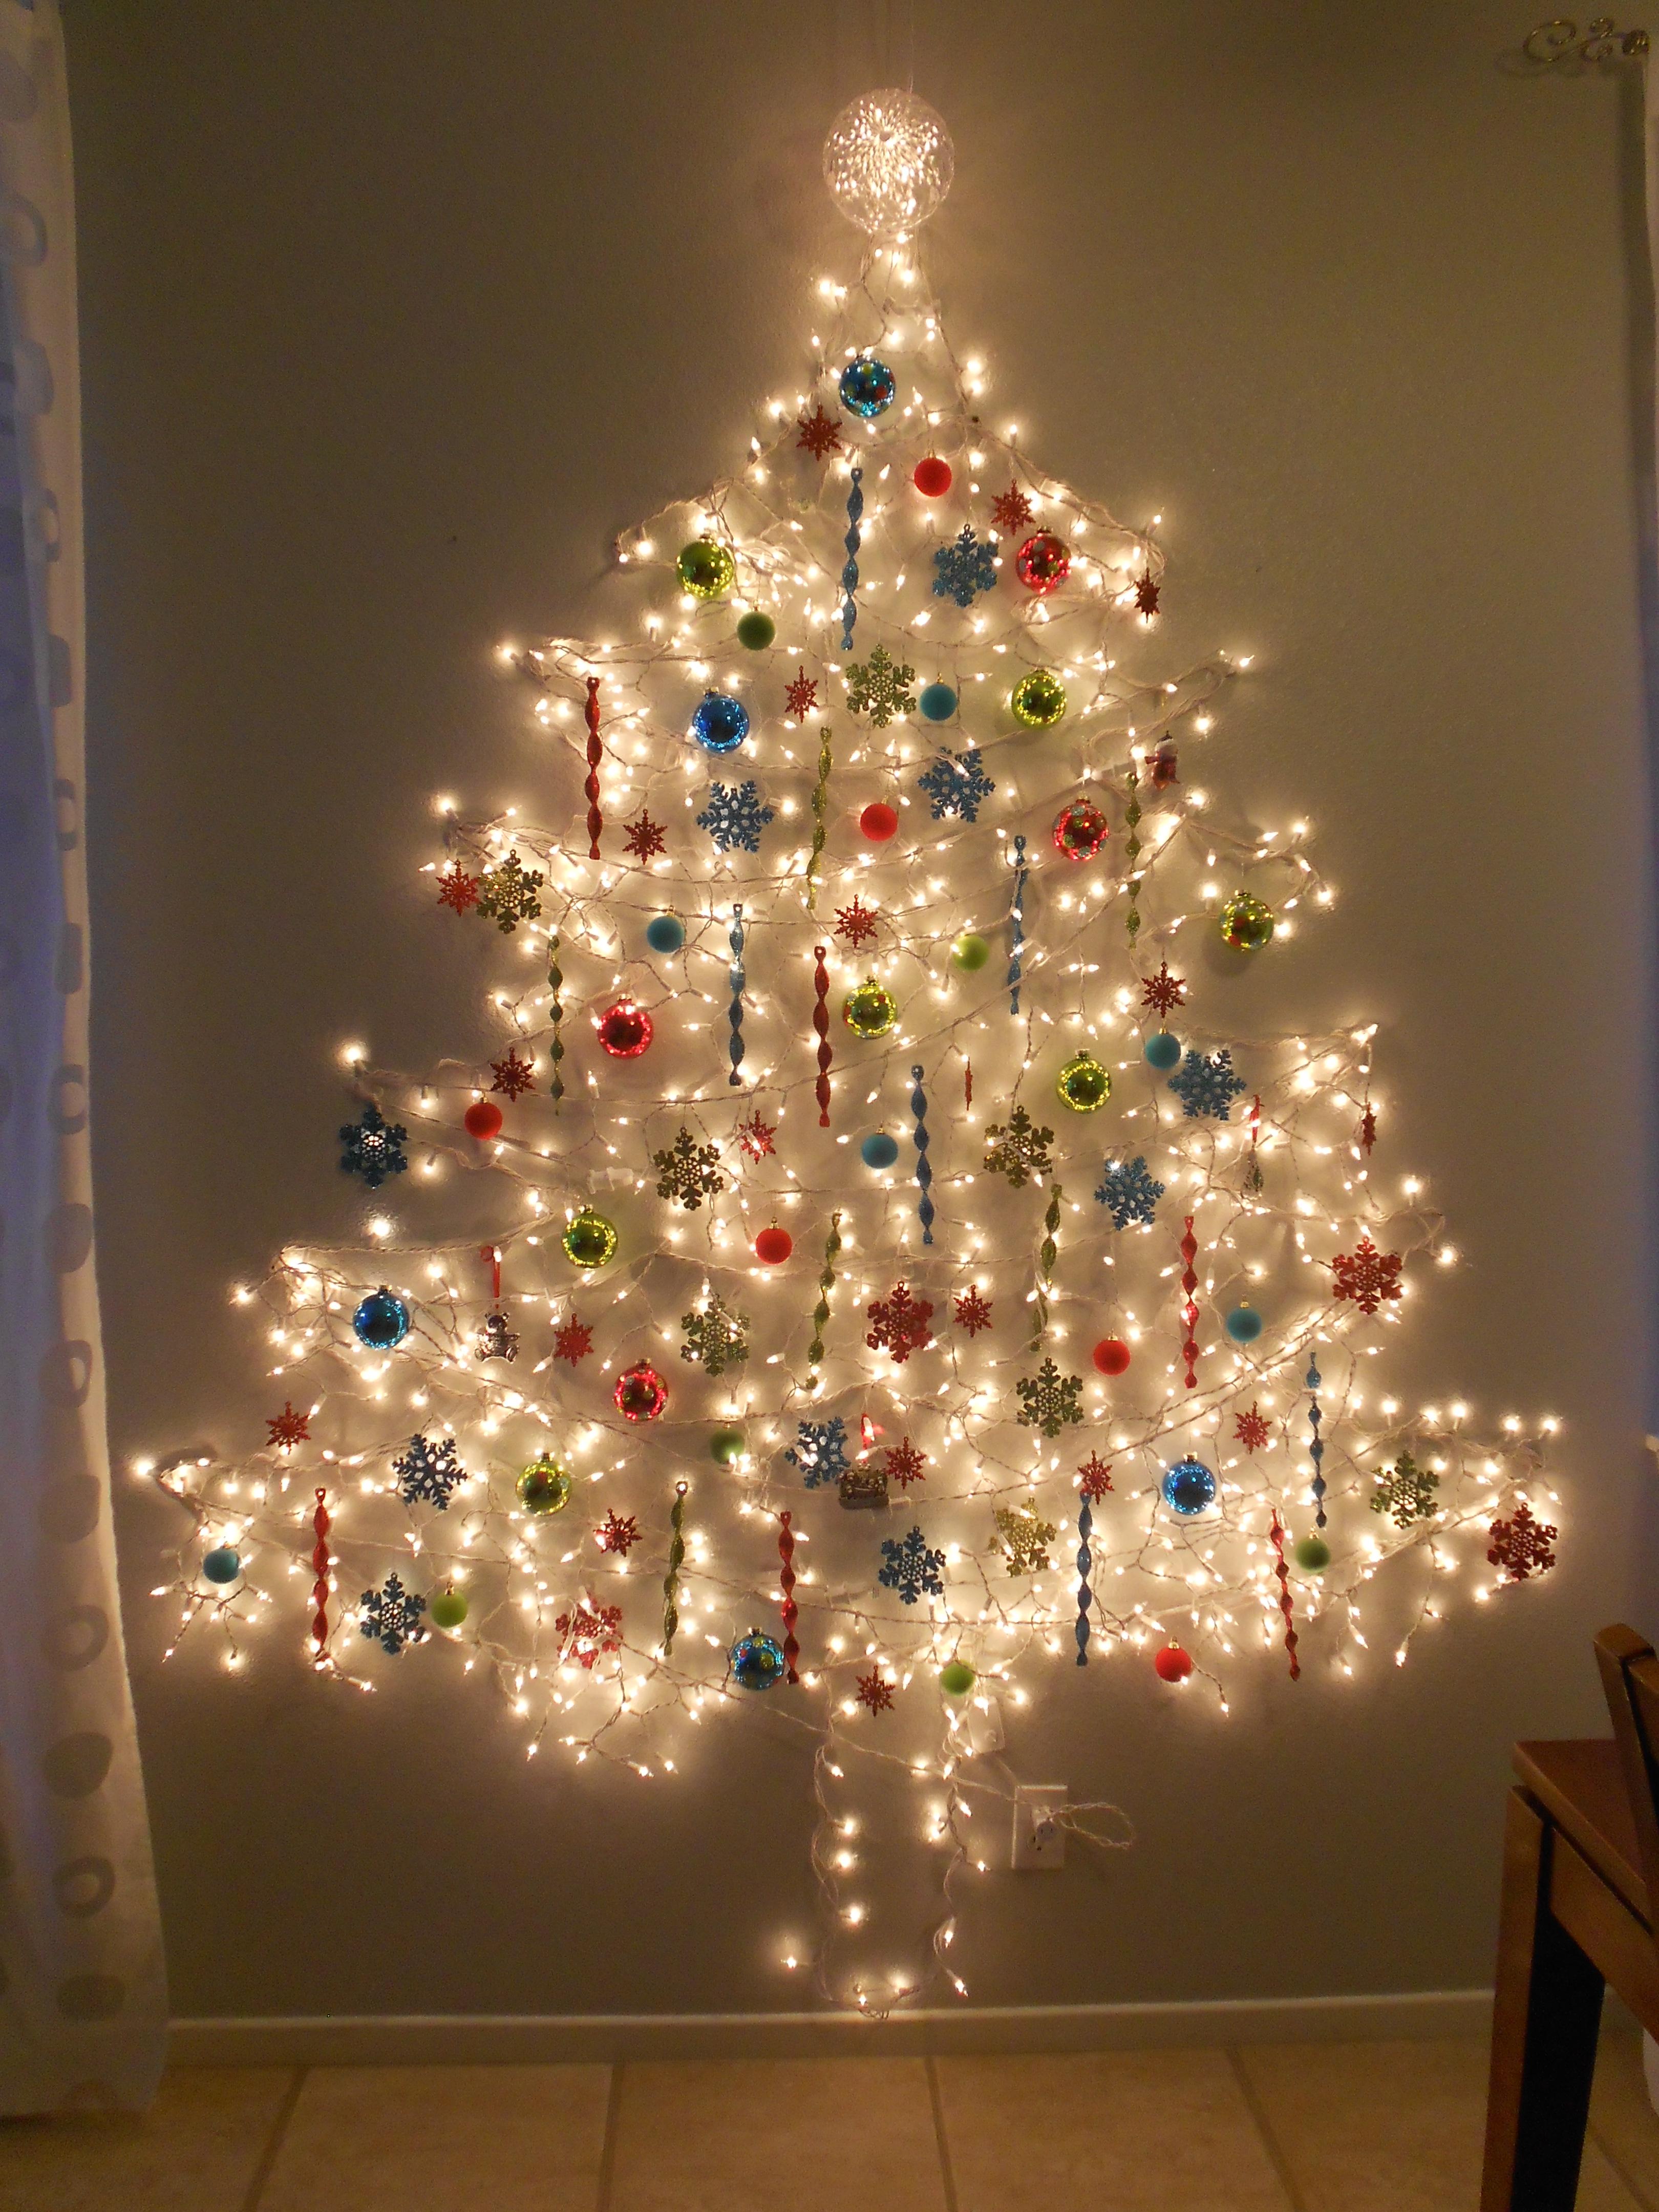 light tree on wall photo - 2